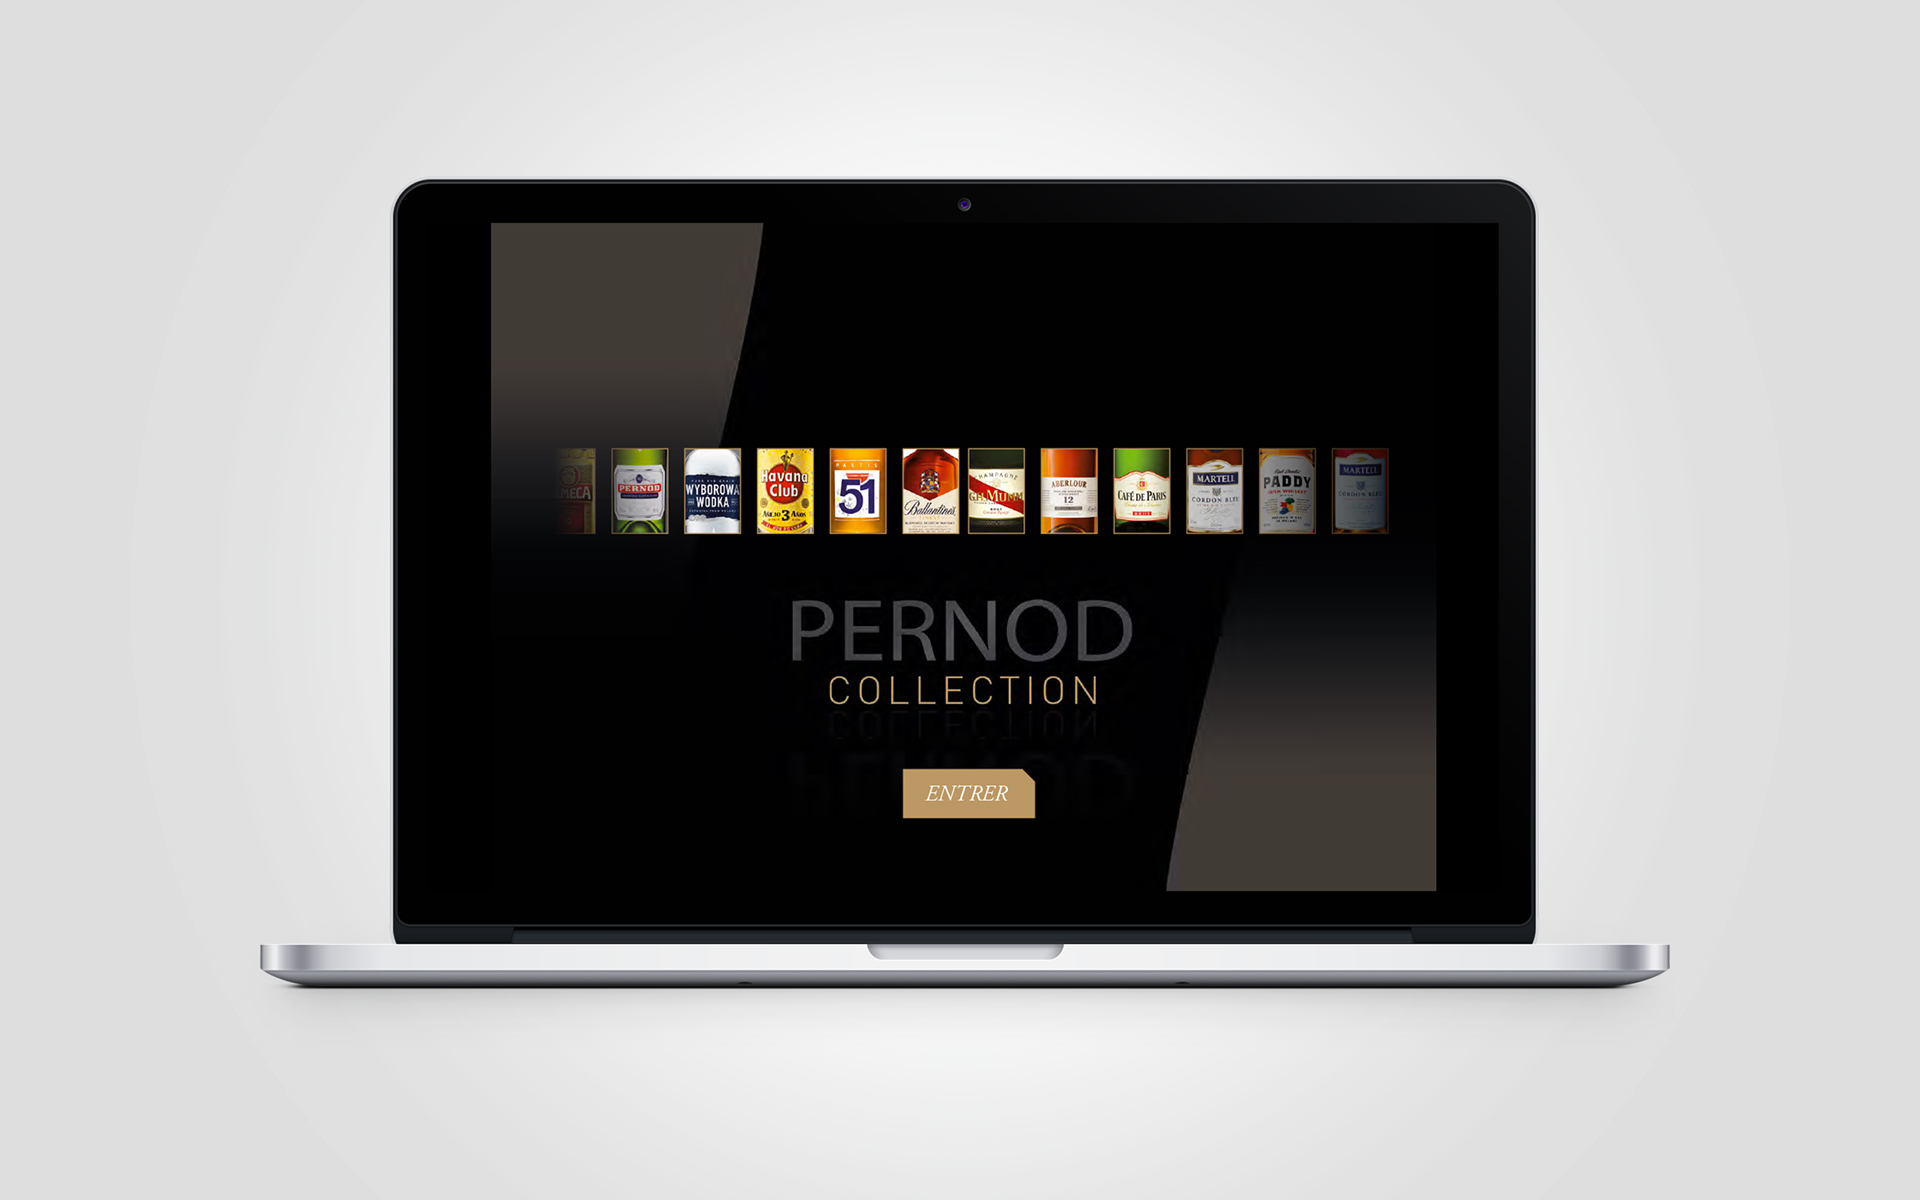 pernod-dynamique